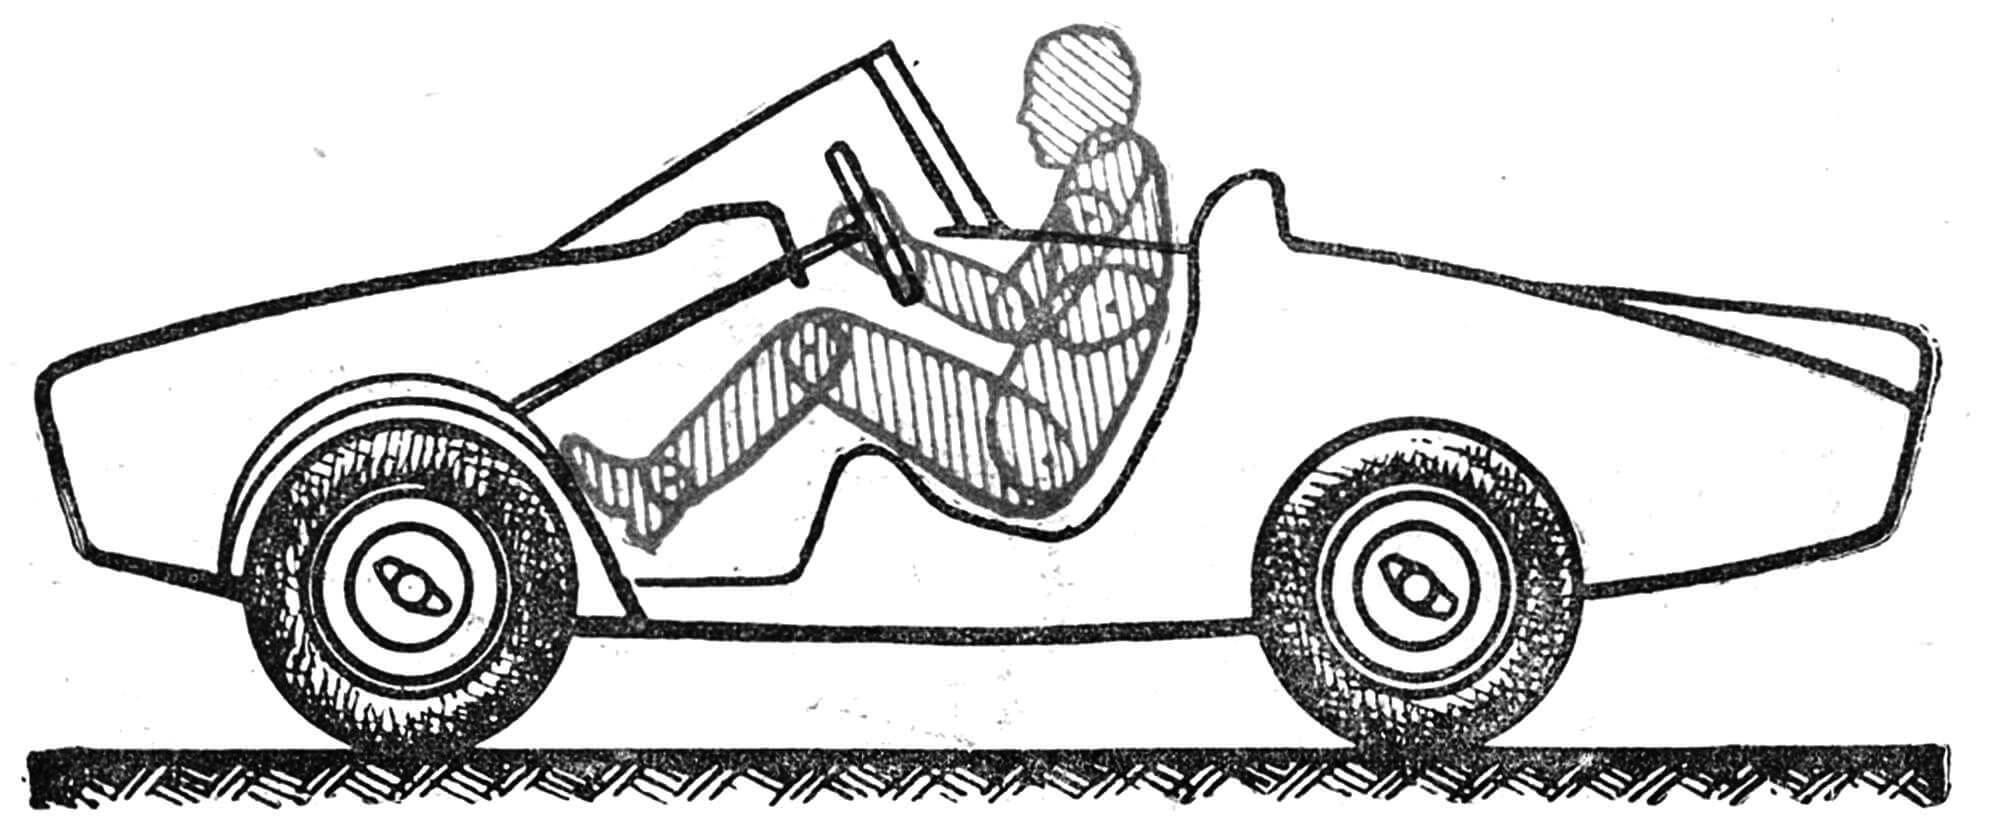 Рис. 3. Определение габаритов рулевого поста на микроавтомобиле.